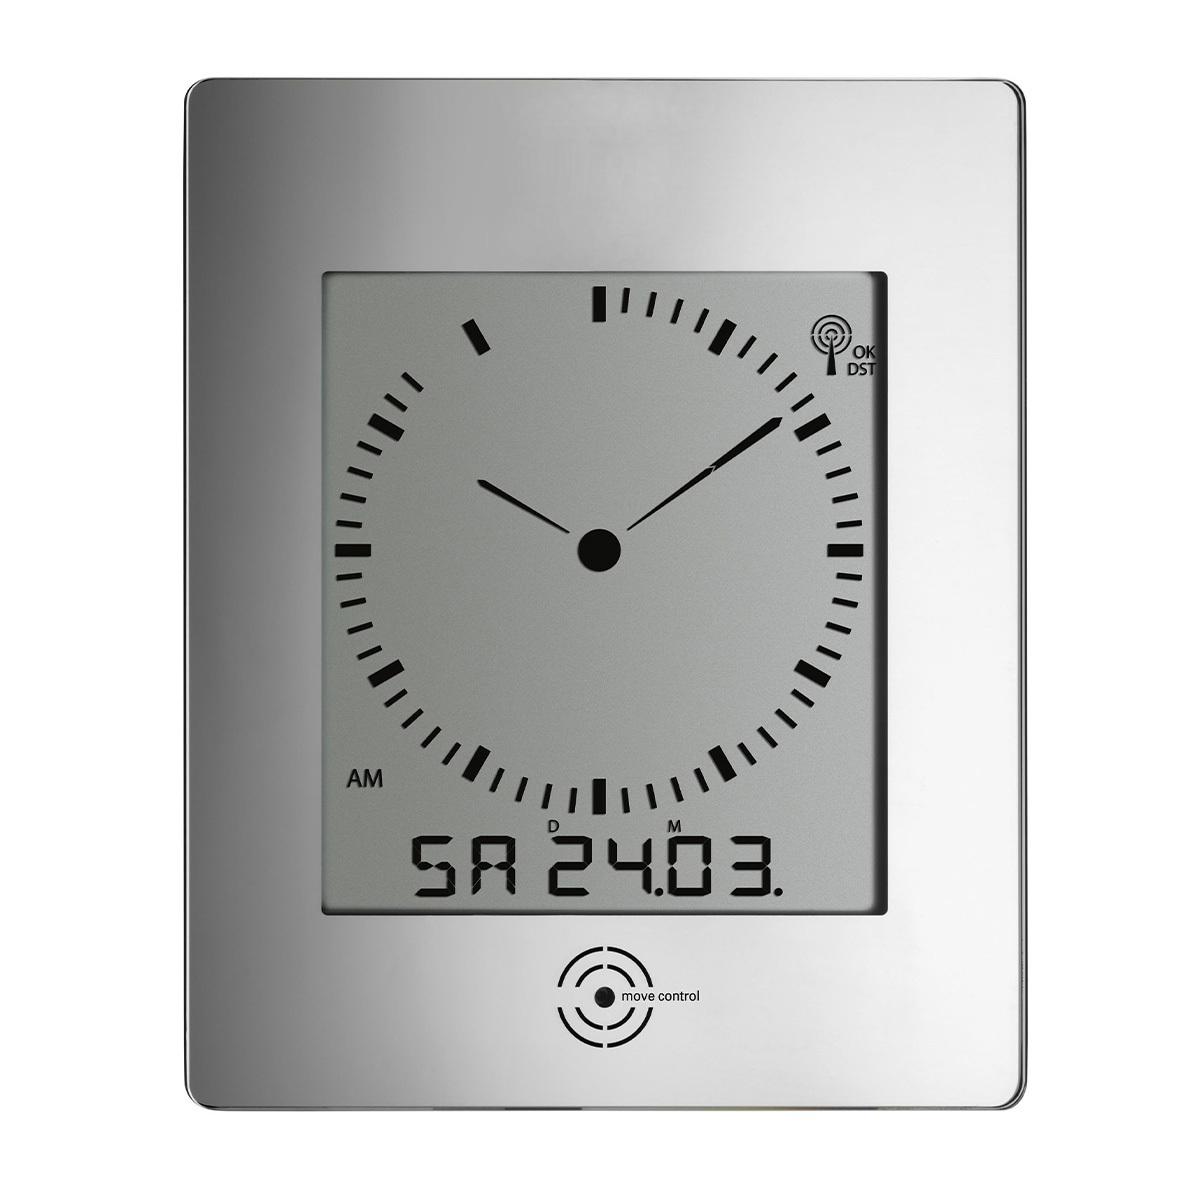 60-4507-digitale-funk-wanduhr-mit-analogem-zifferblatt-raumklima-datum-ansicht5-1200x1200px.jpg